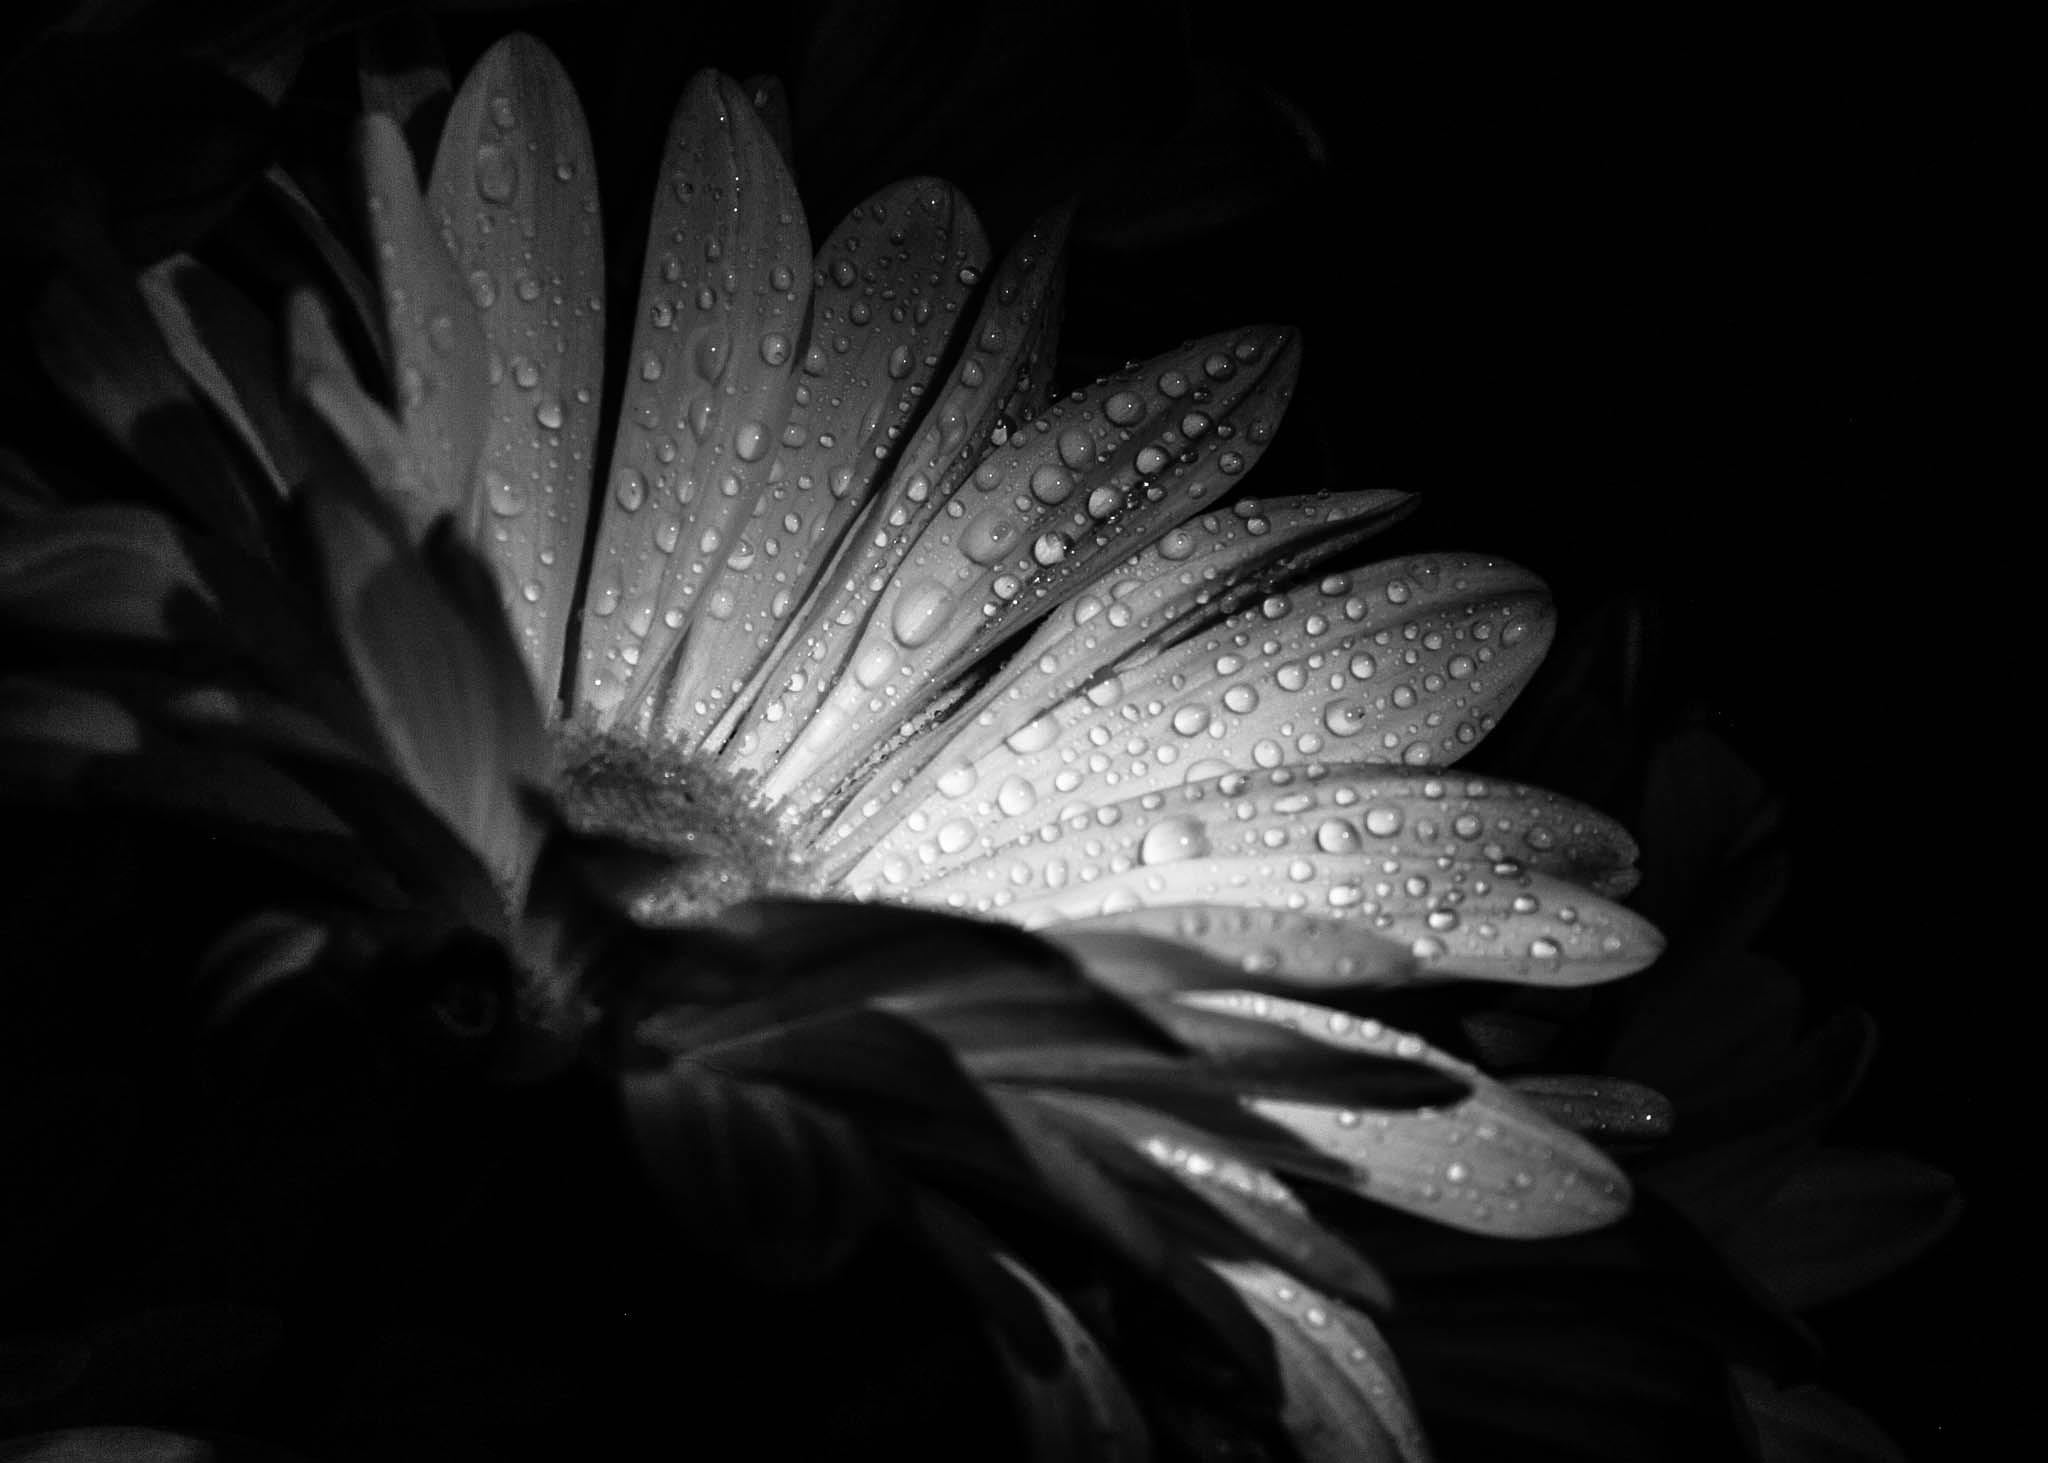 B&W flower by Smiley544